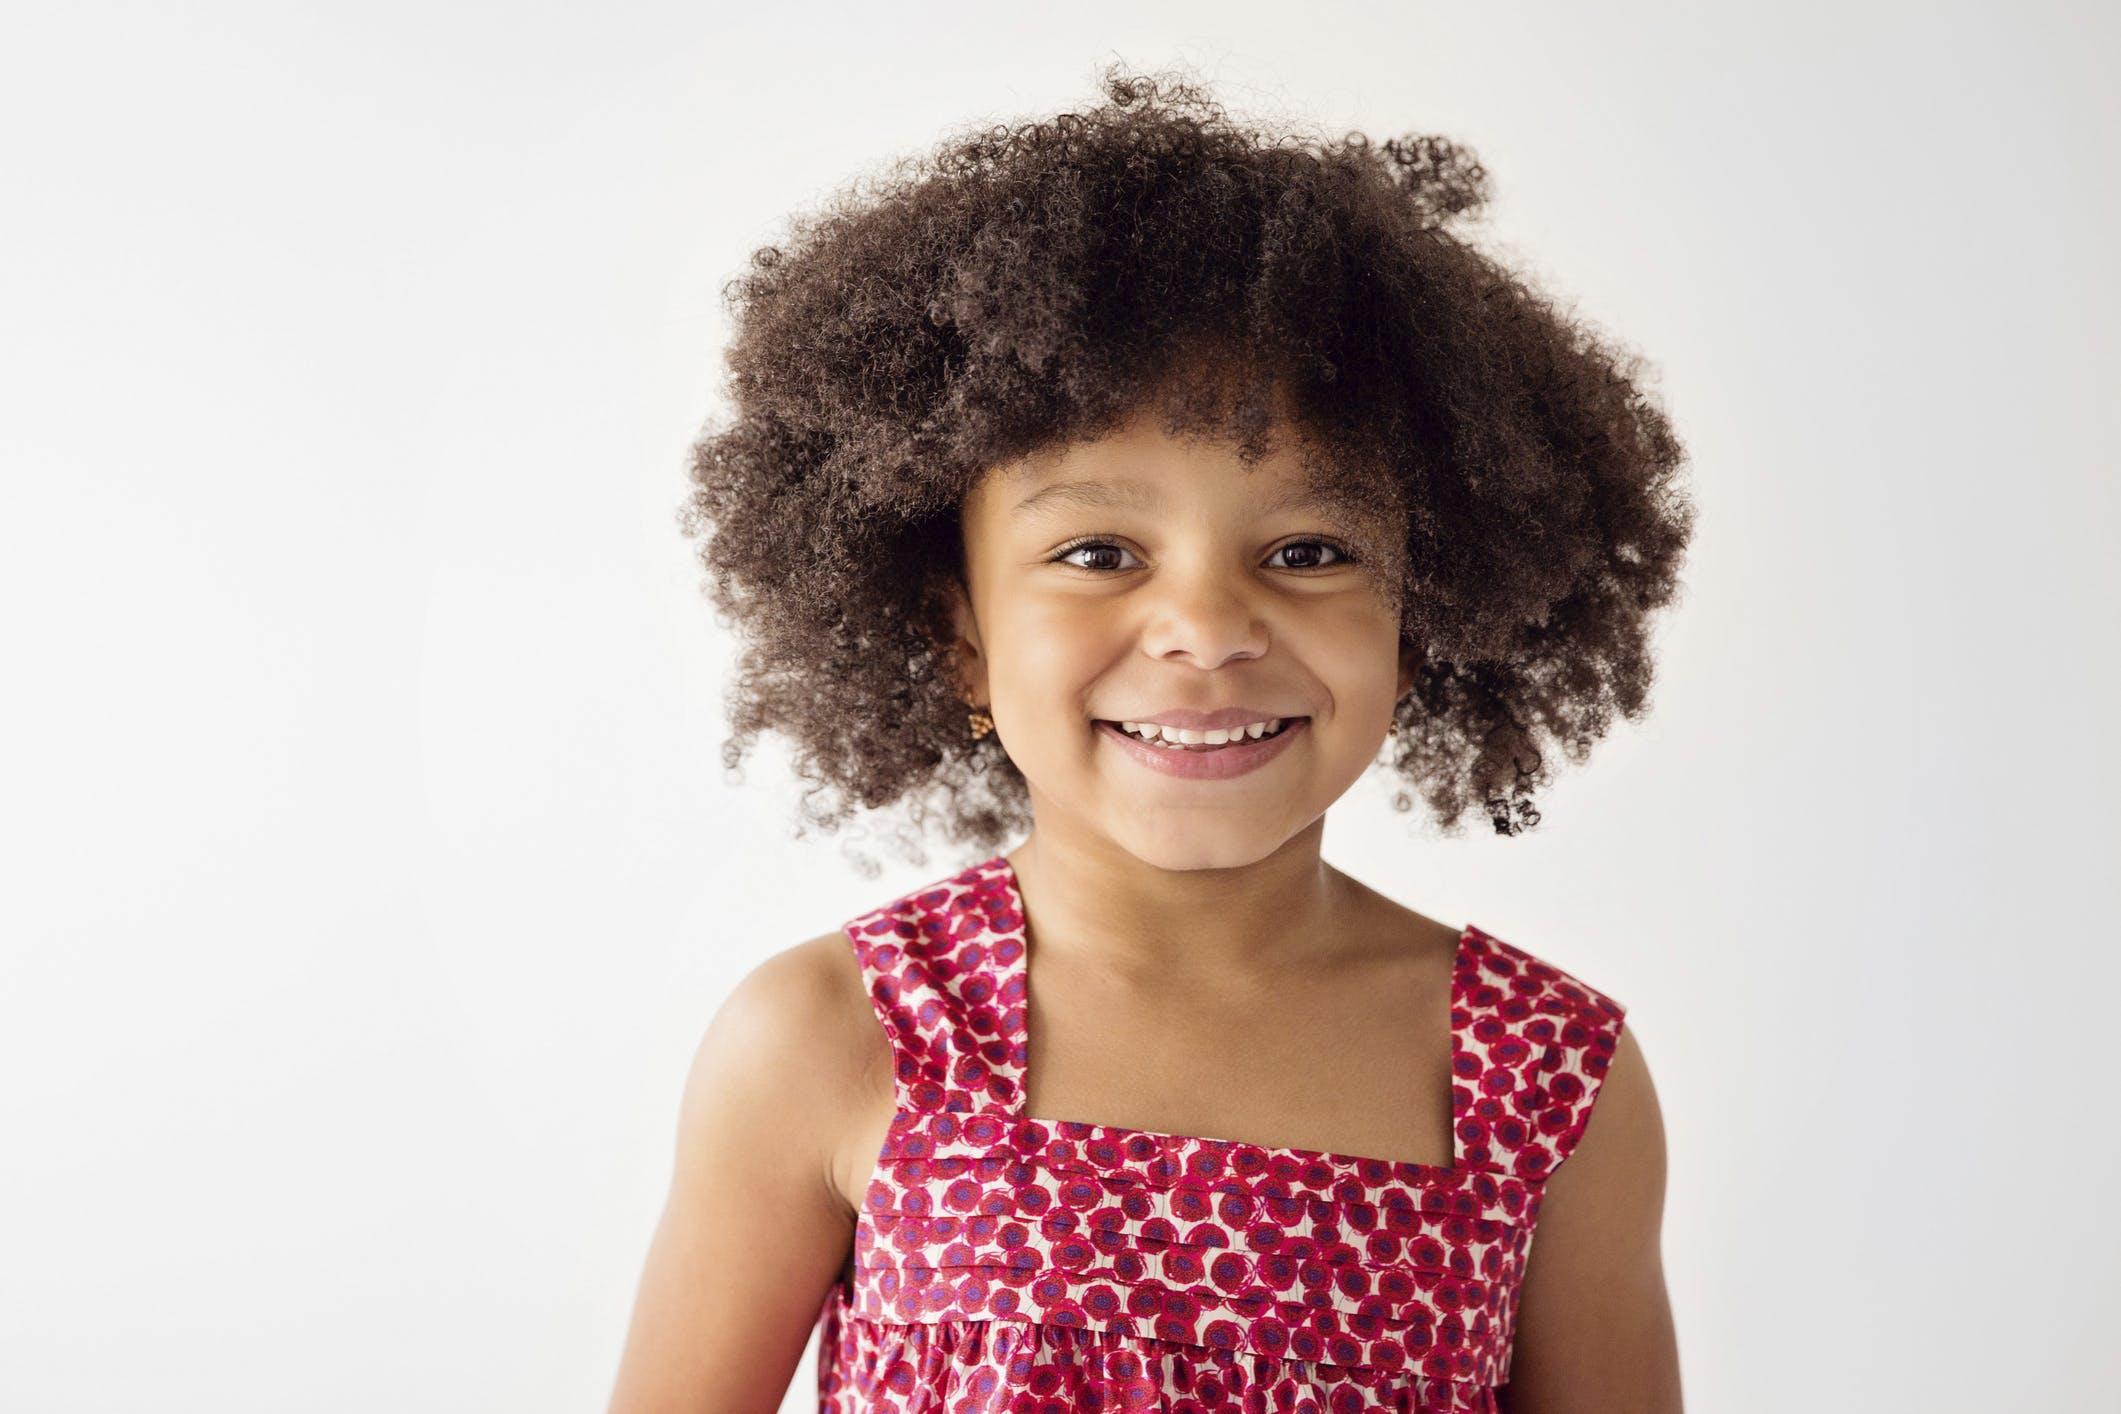 Cute black girl wearing dress white background.jpg?ixlib=rails 3.0